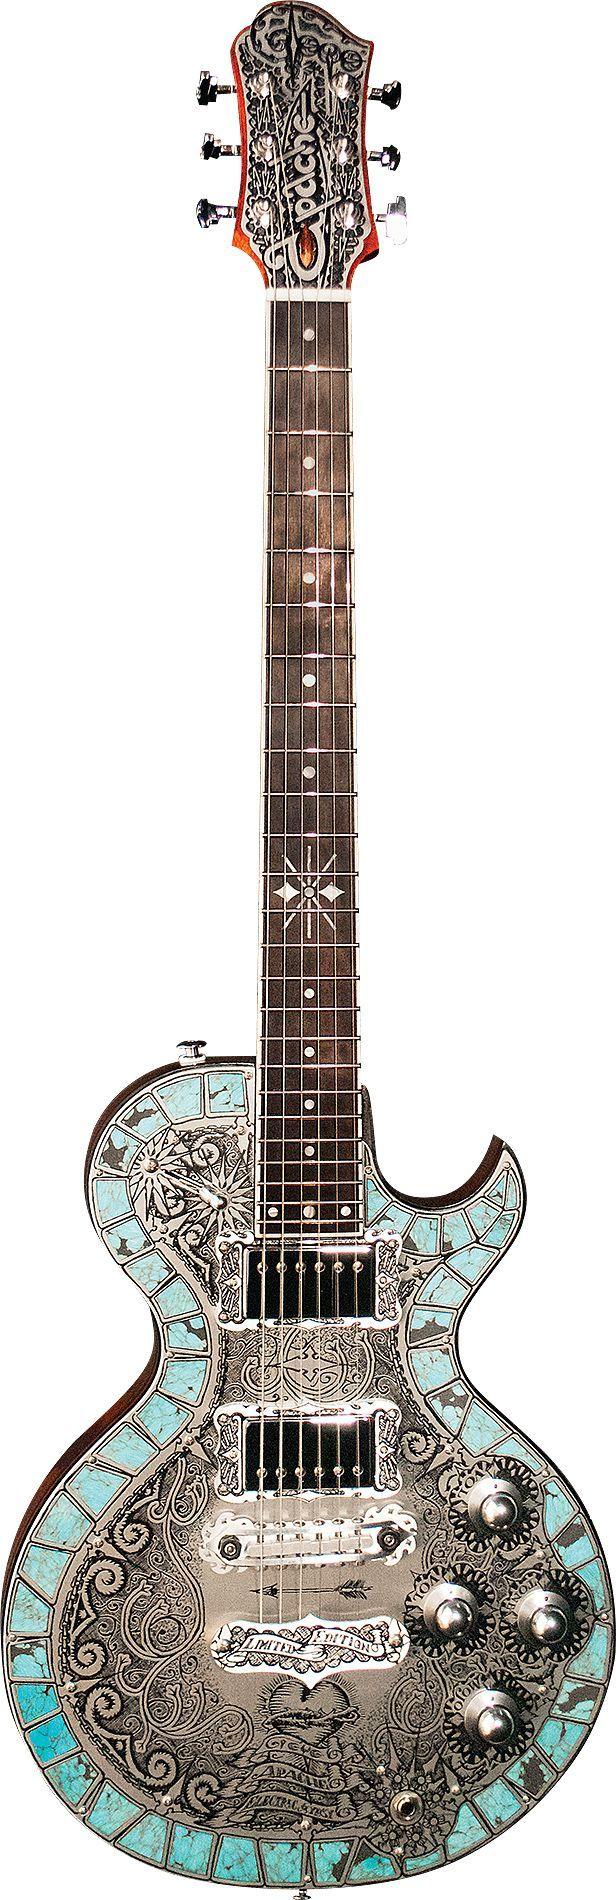 Teye Apache | Vintage Guitar® magazine